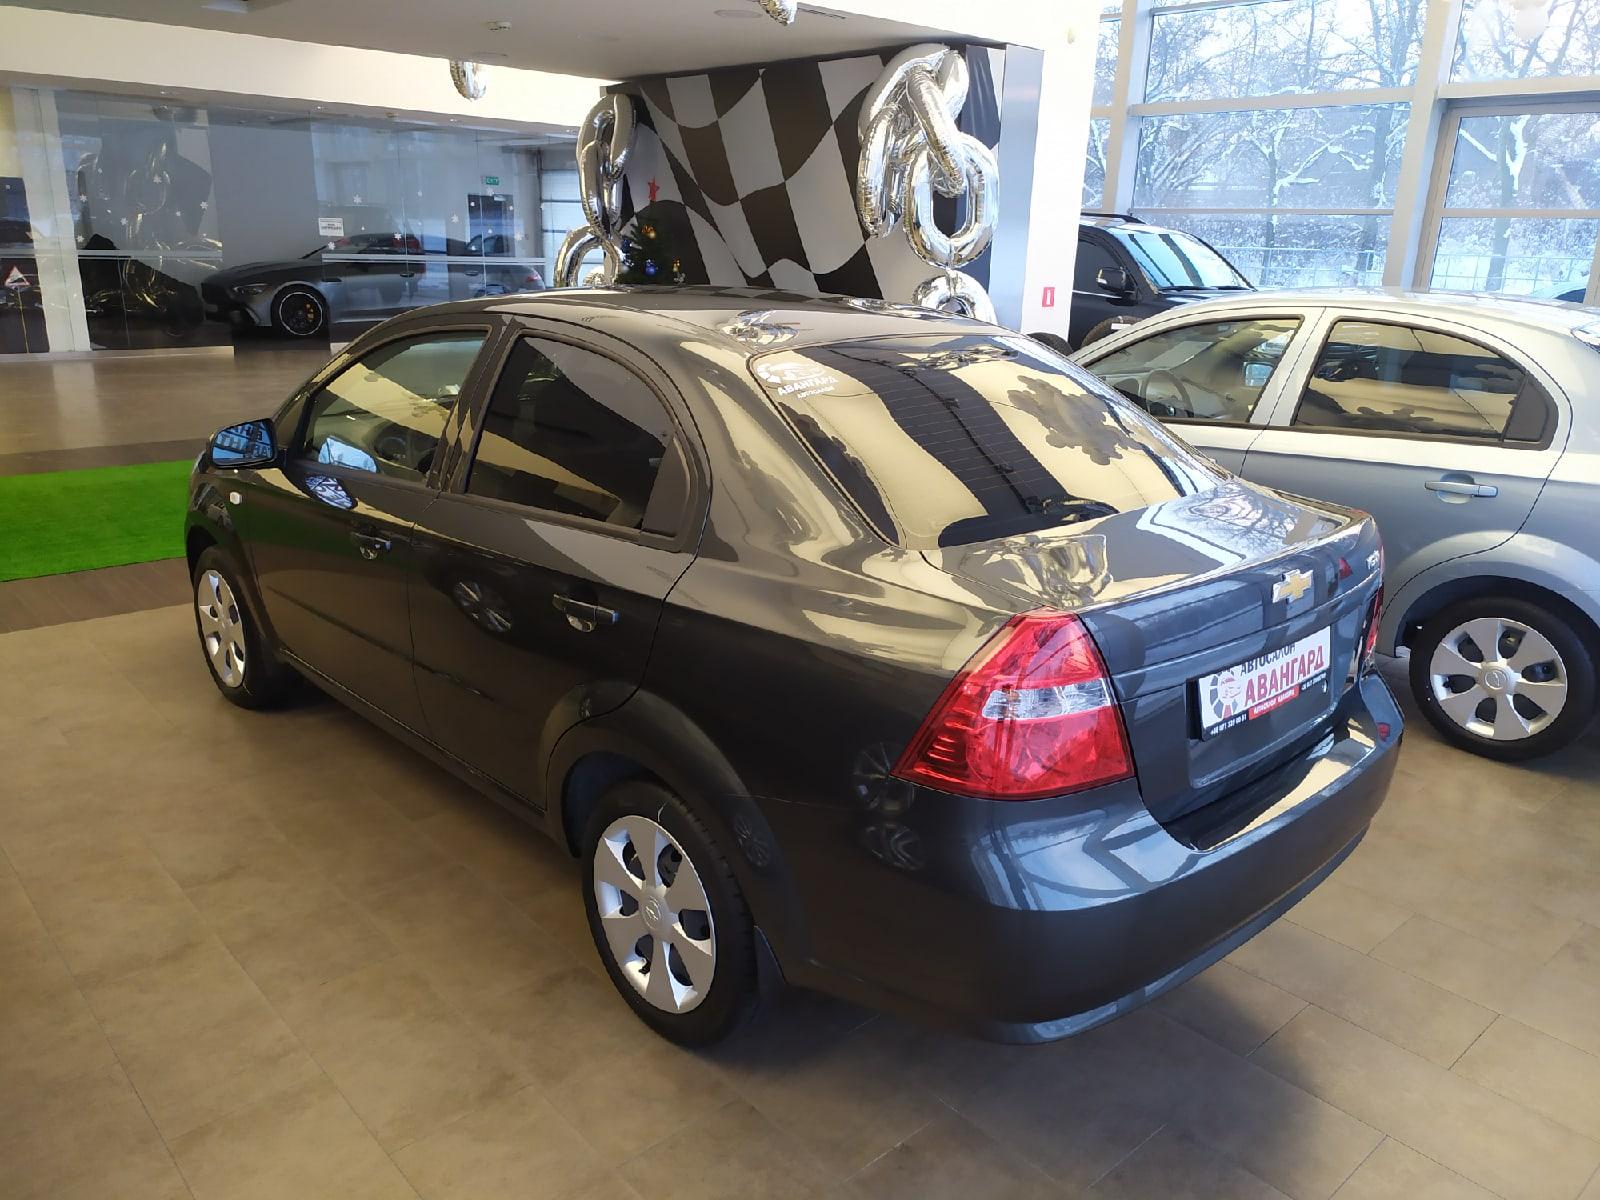 Chevrolet Nexia 1.5 16 кл. (105 л.с.) 6АТ комплектации LT, цвет серый графит